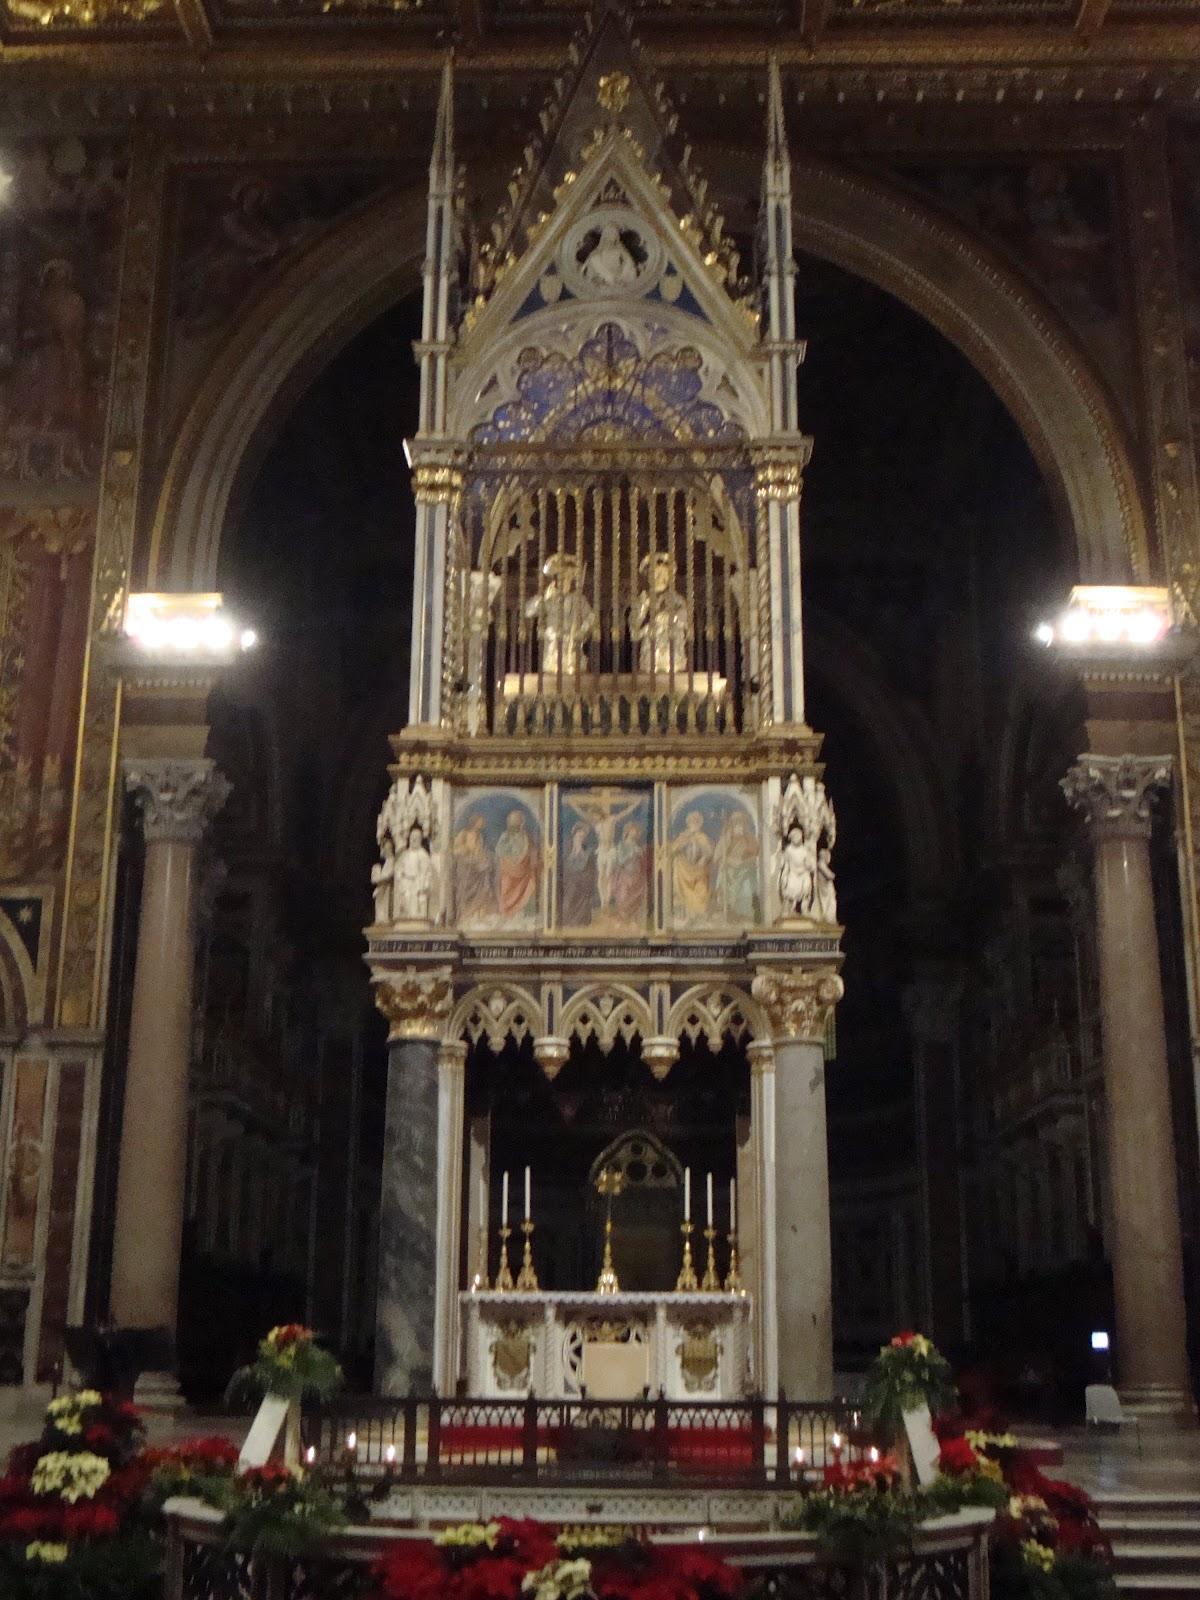 Arquitectura arte sacro y liturgia d nde celebrar la for Arquitectura sacro